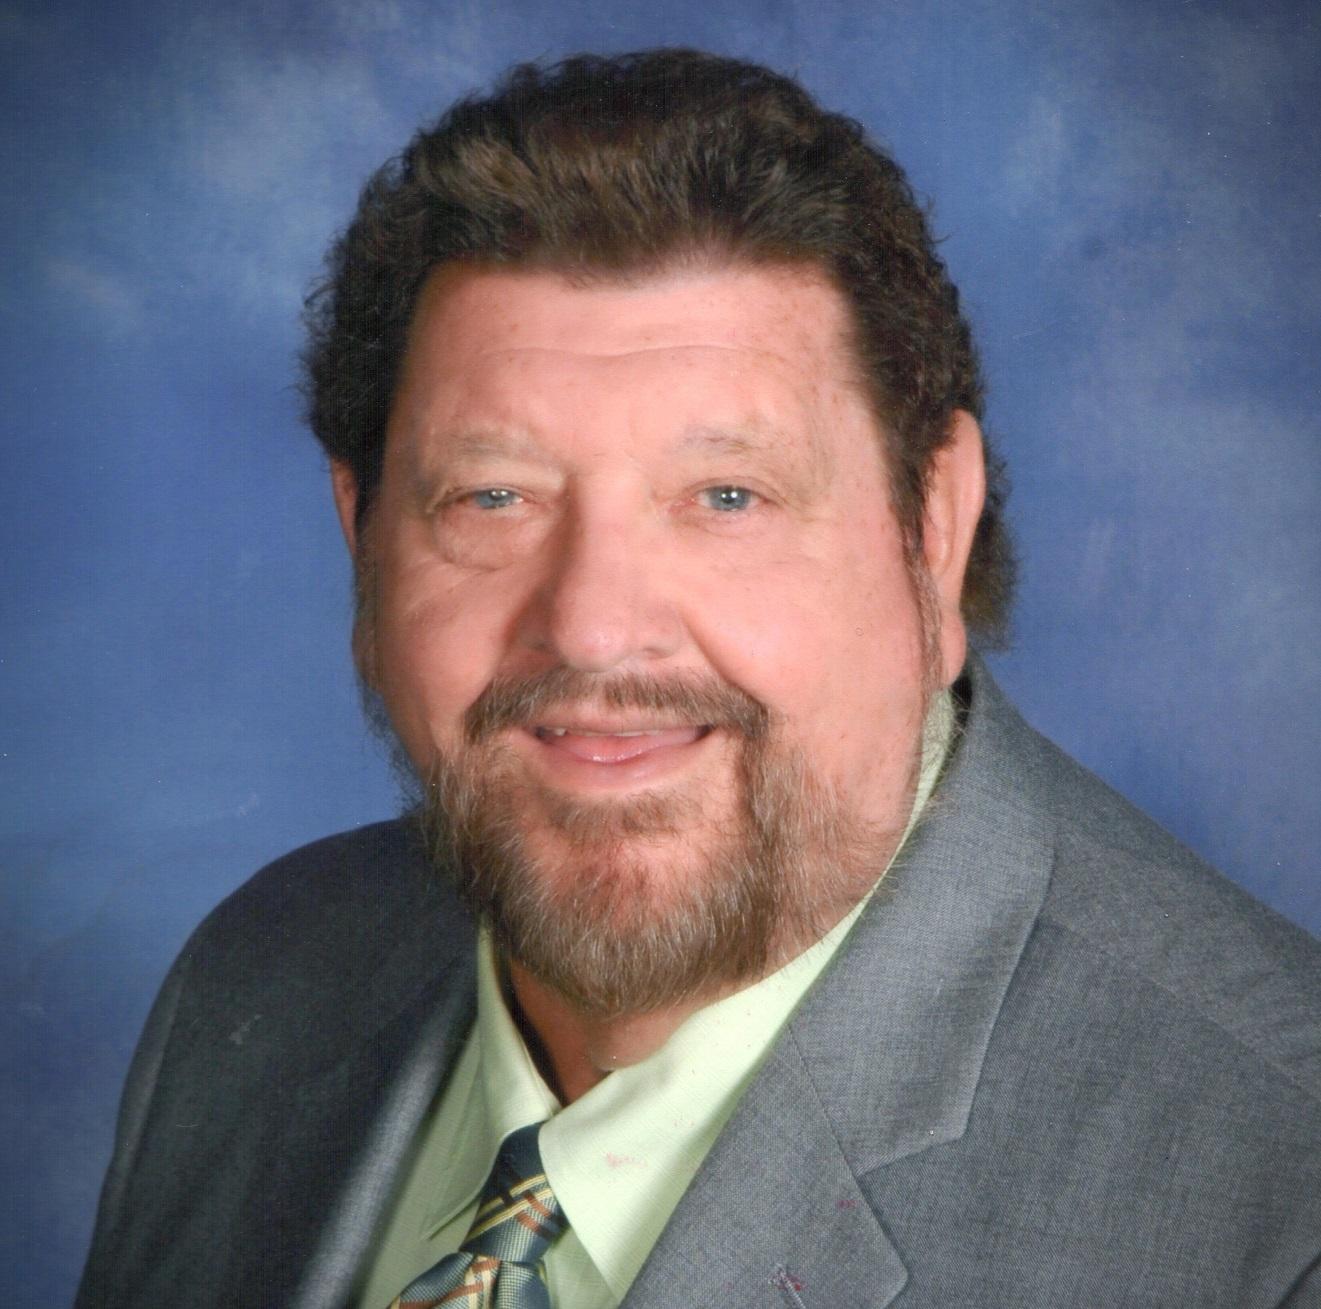 Edward J. Sander, age 73 of Jasper